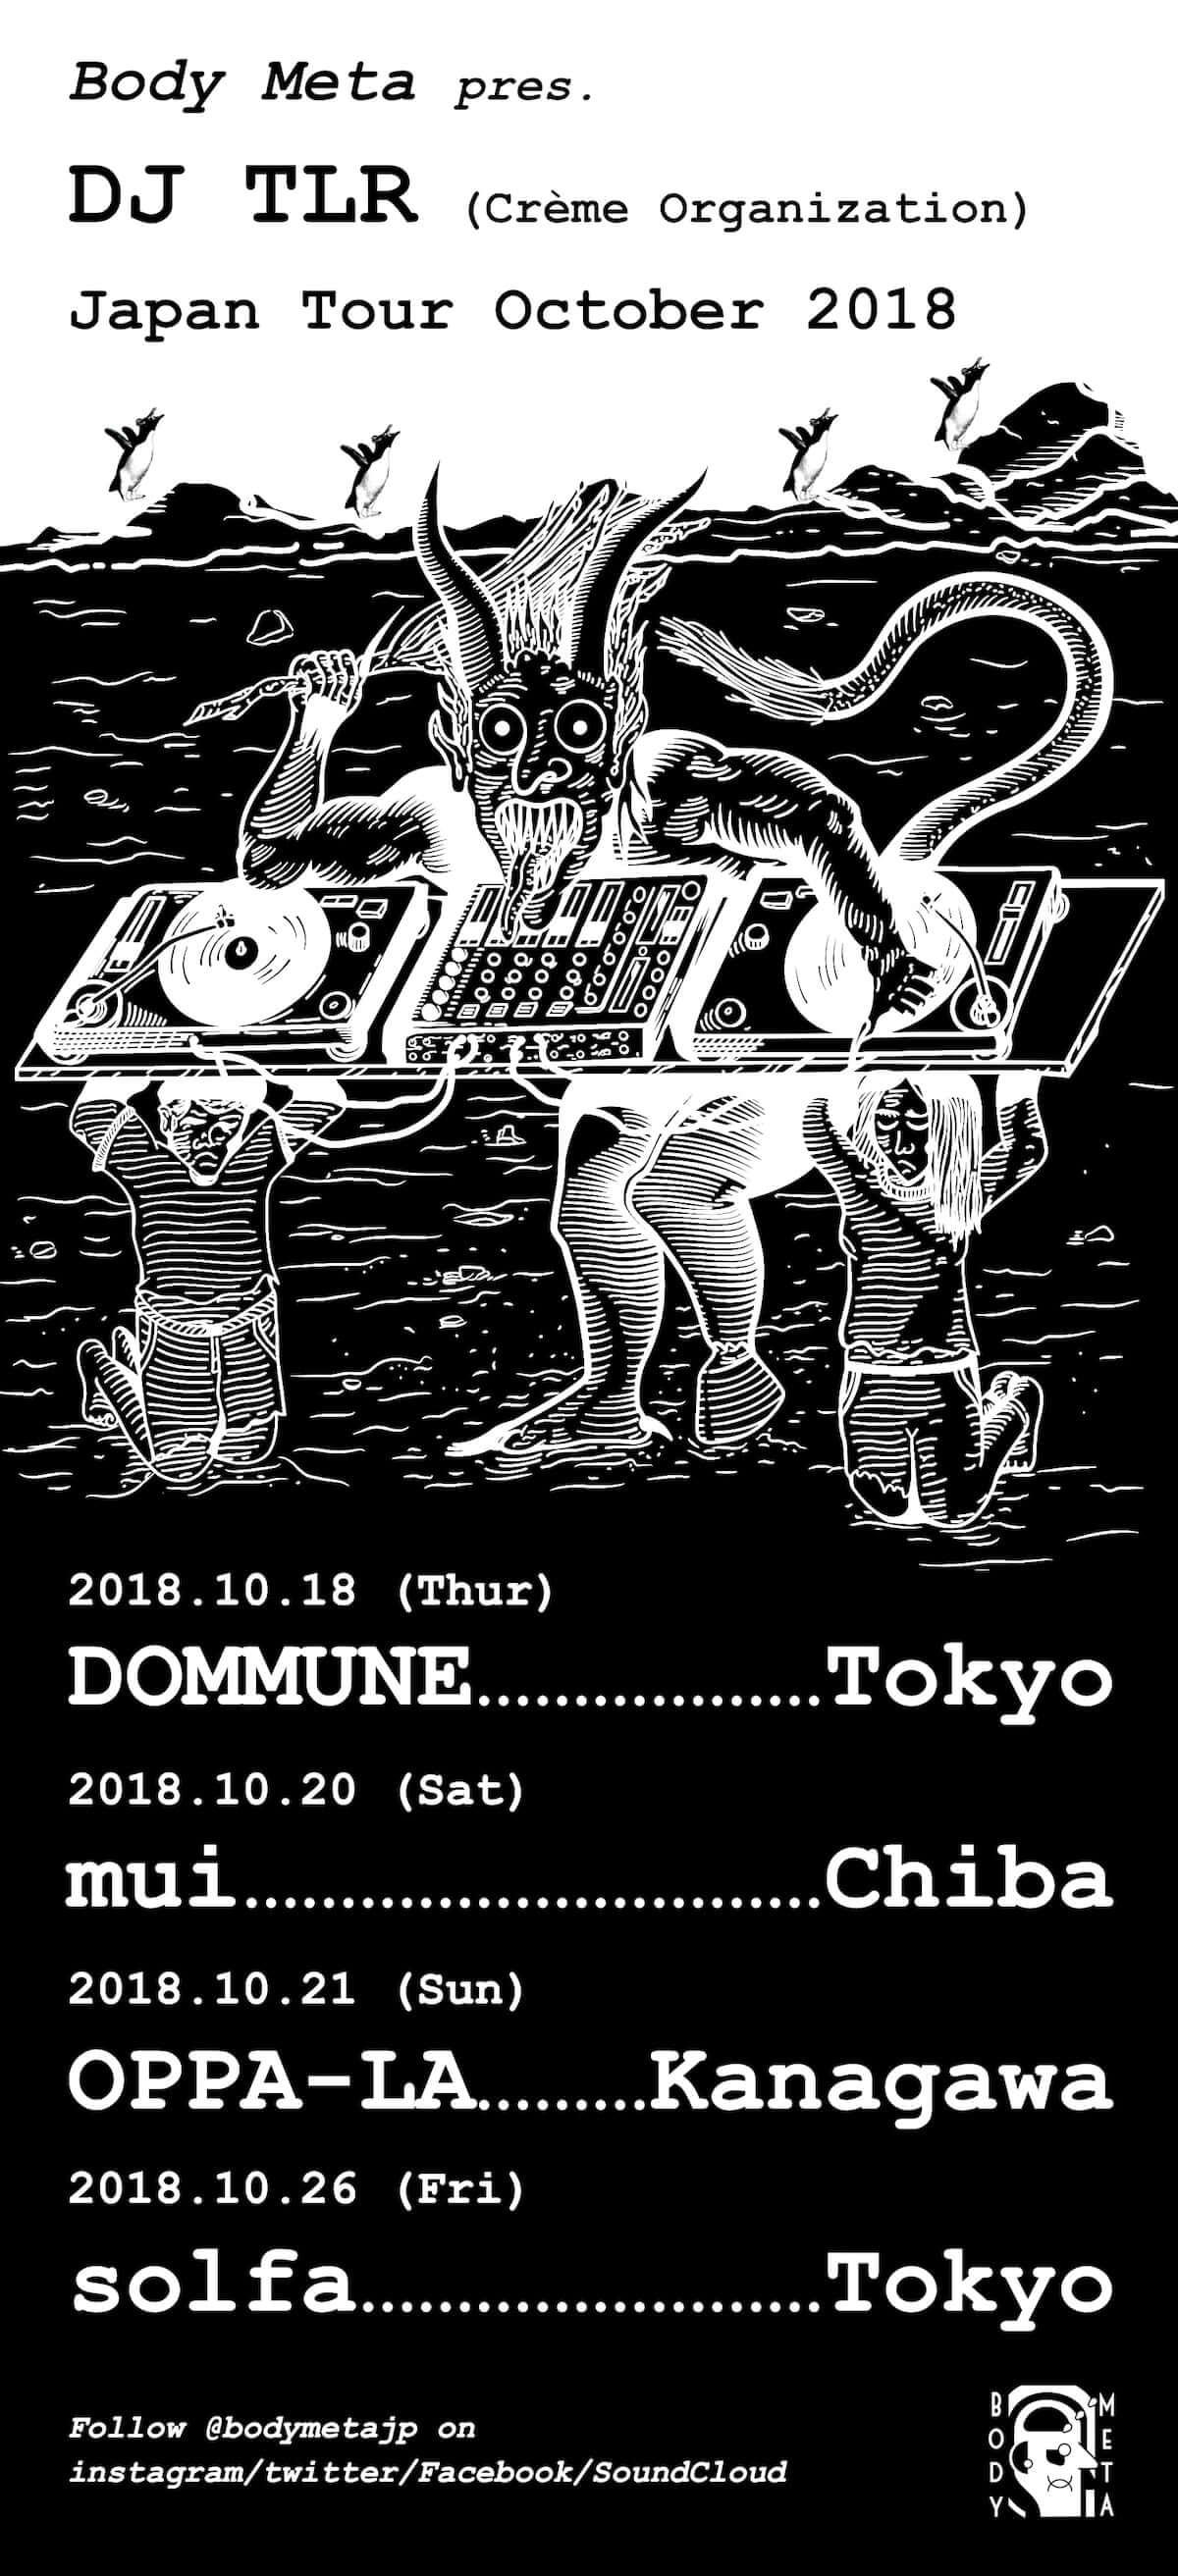 Crème Organizationのボス、DJ TLRが2018年10月に再来日ツアーを敢行|東京公演はSkatebårdとのダブル・ヘッドライナー music181007-bodymeta-djtlr-1-1200x2625